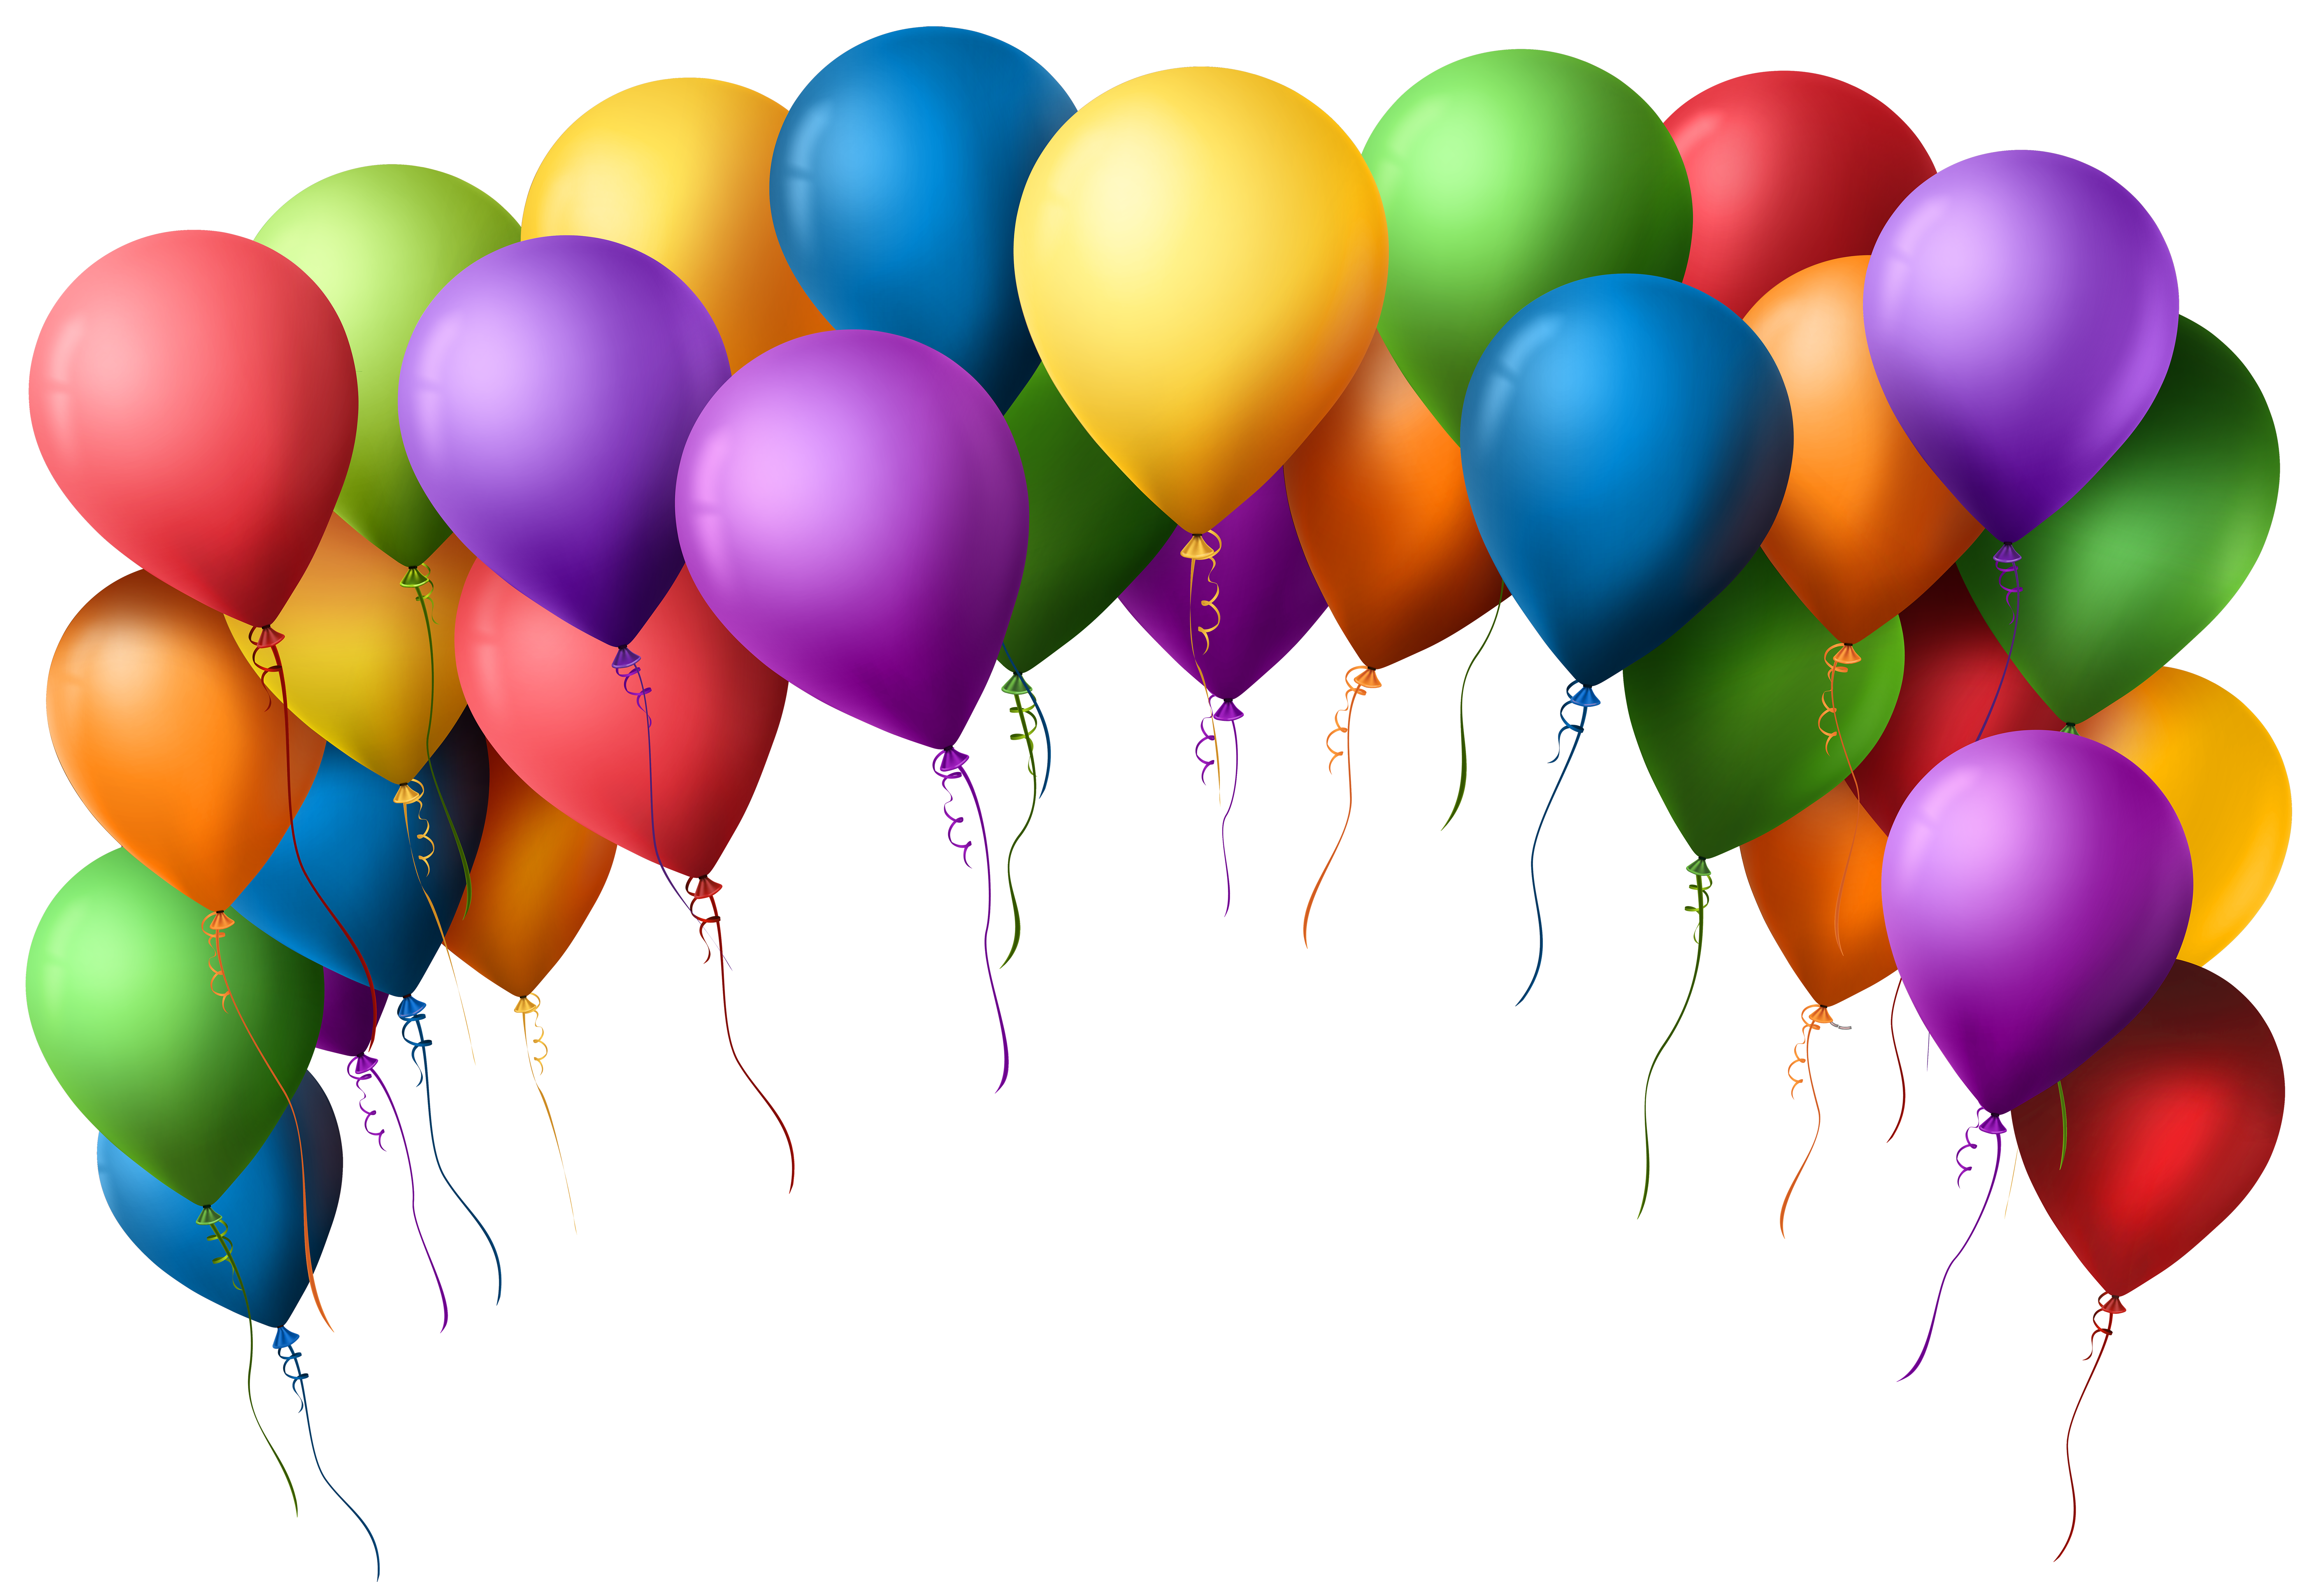 7000x4766 Balloon Images Clip Art